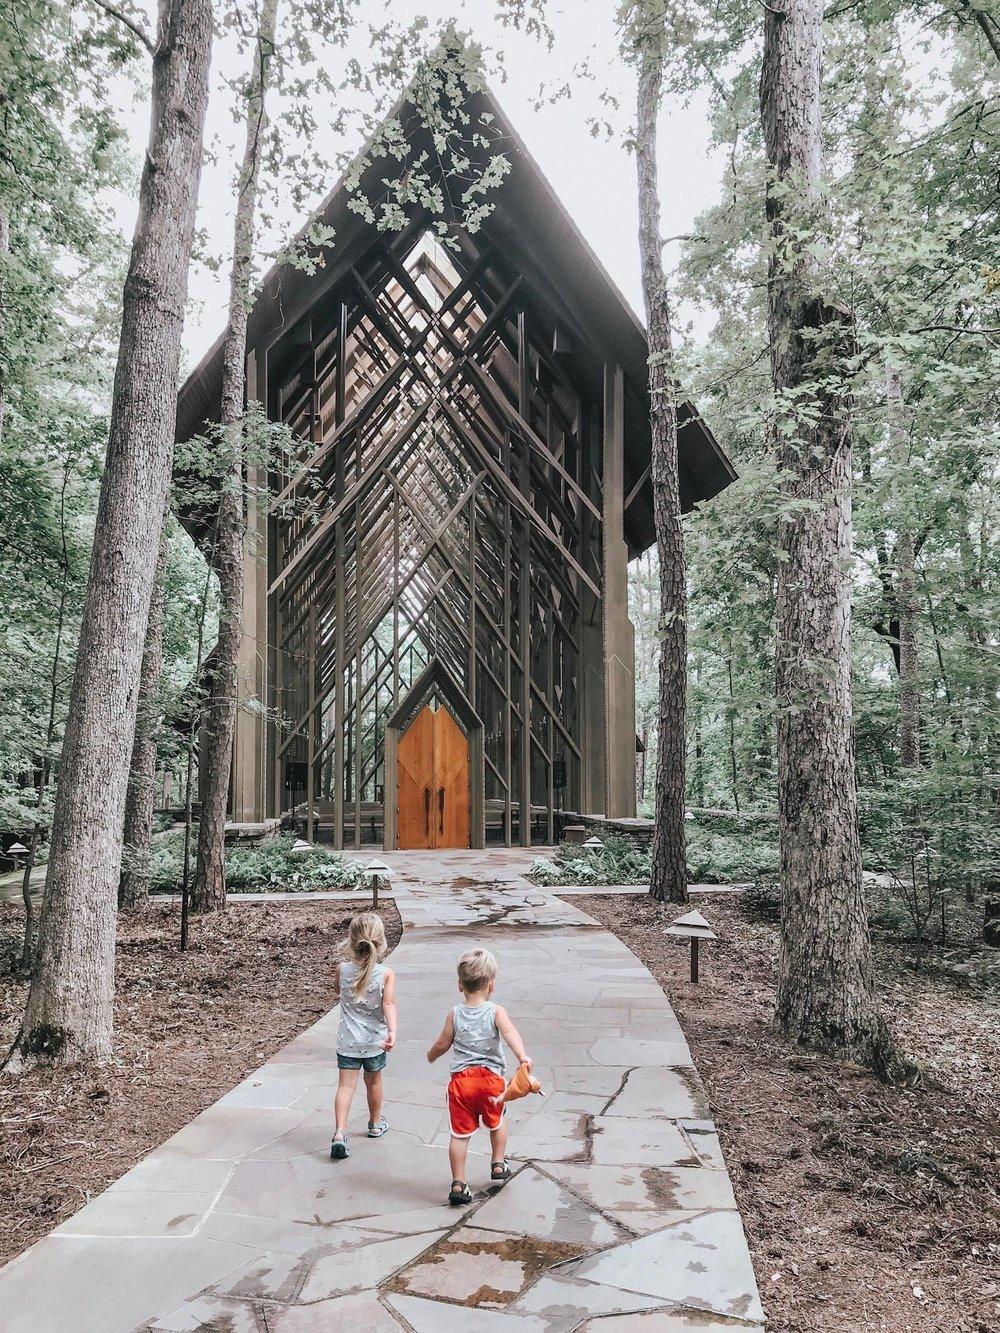 anthony chapel is amazing